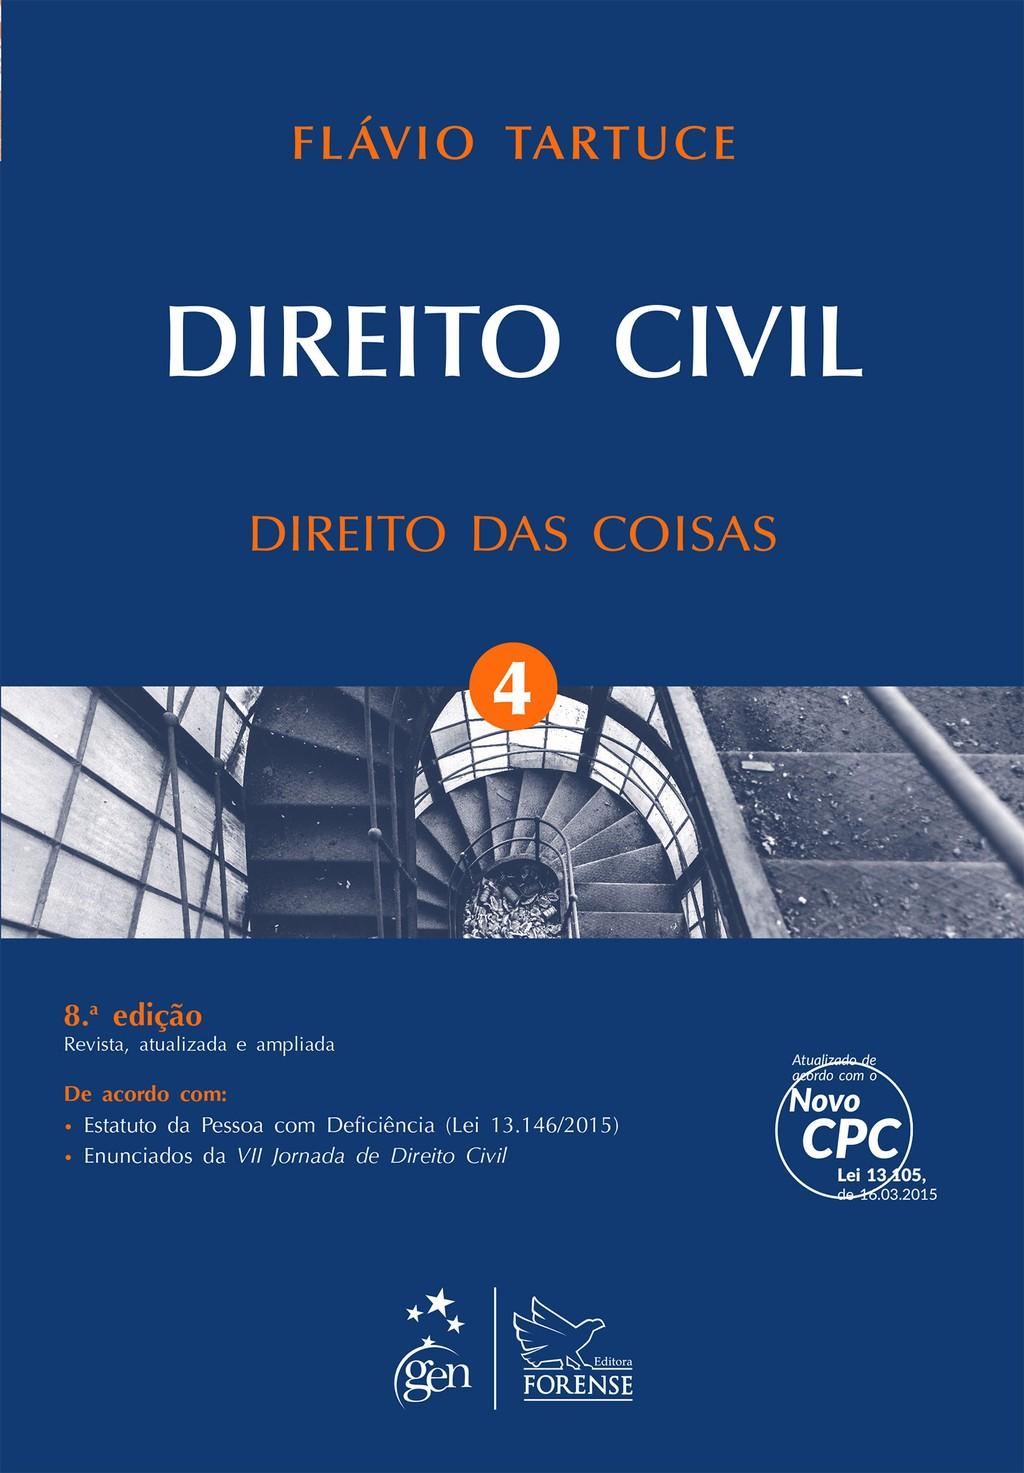 Sorteio Direito Civil Volume 4 Direito das Coisas 9 de maro